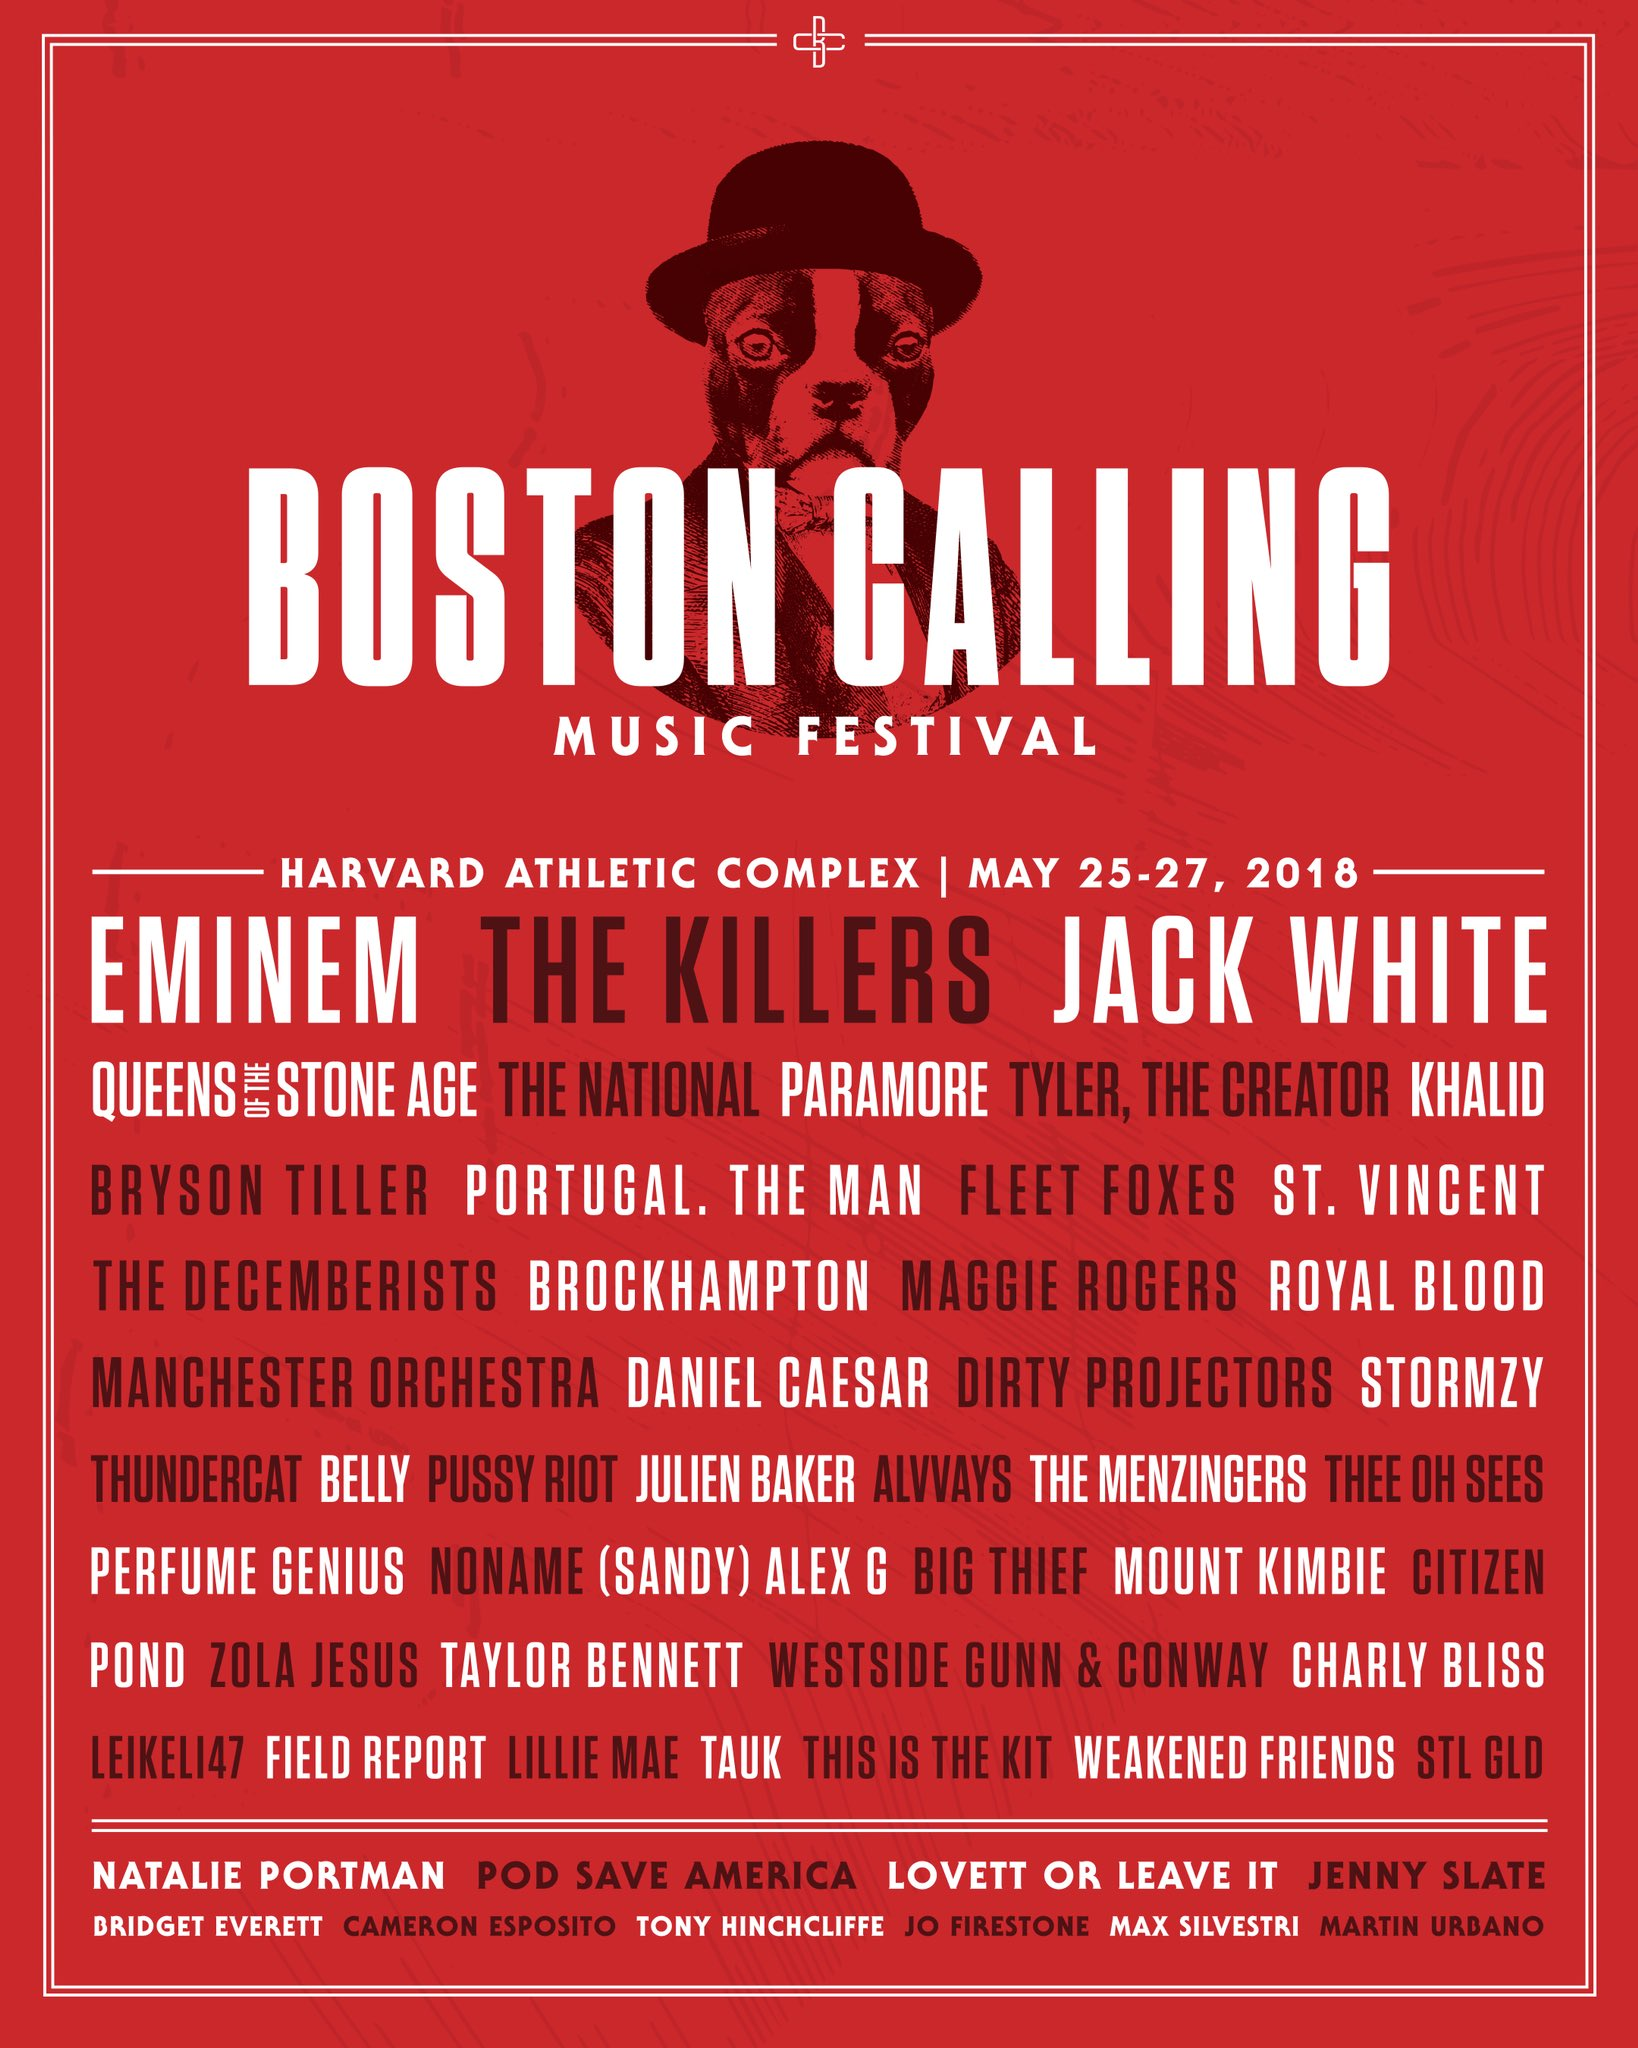 We hear you calling, Boston. https://t.co/pfKgeD0zEo https://t.co/ew5WInVcCe